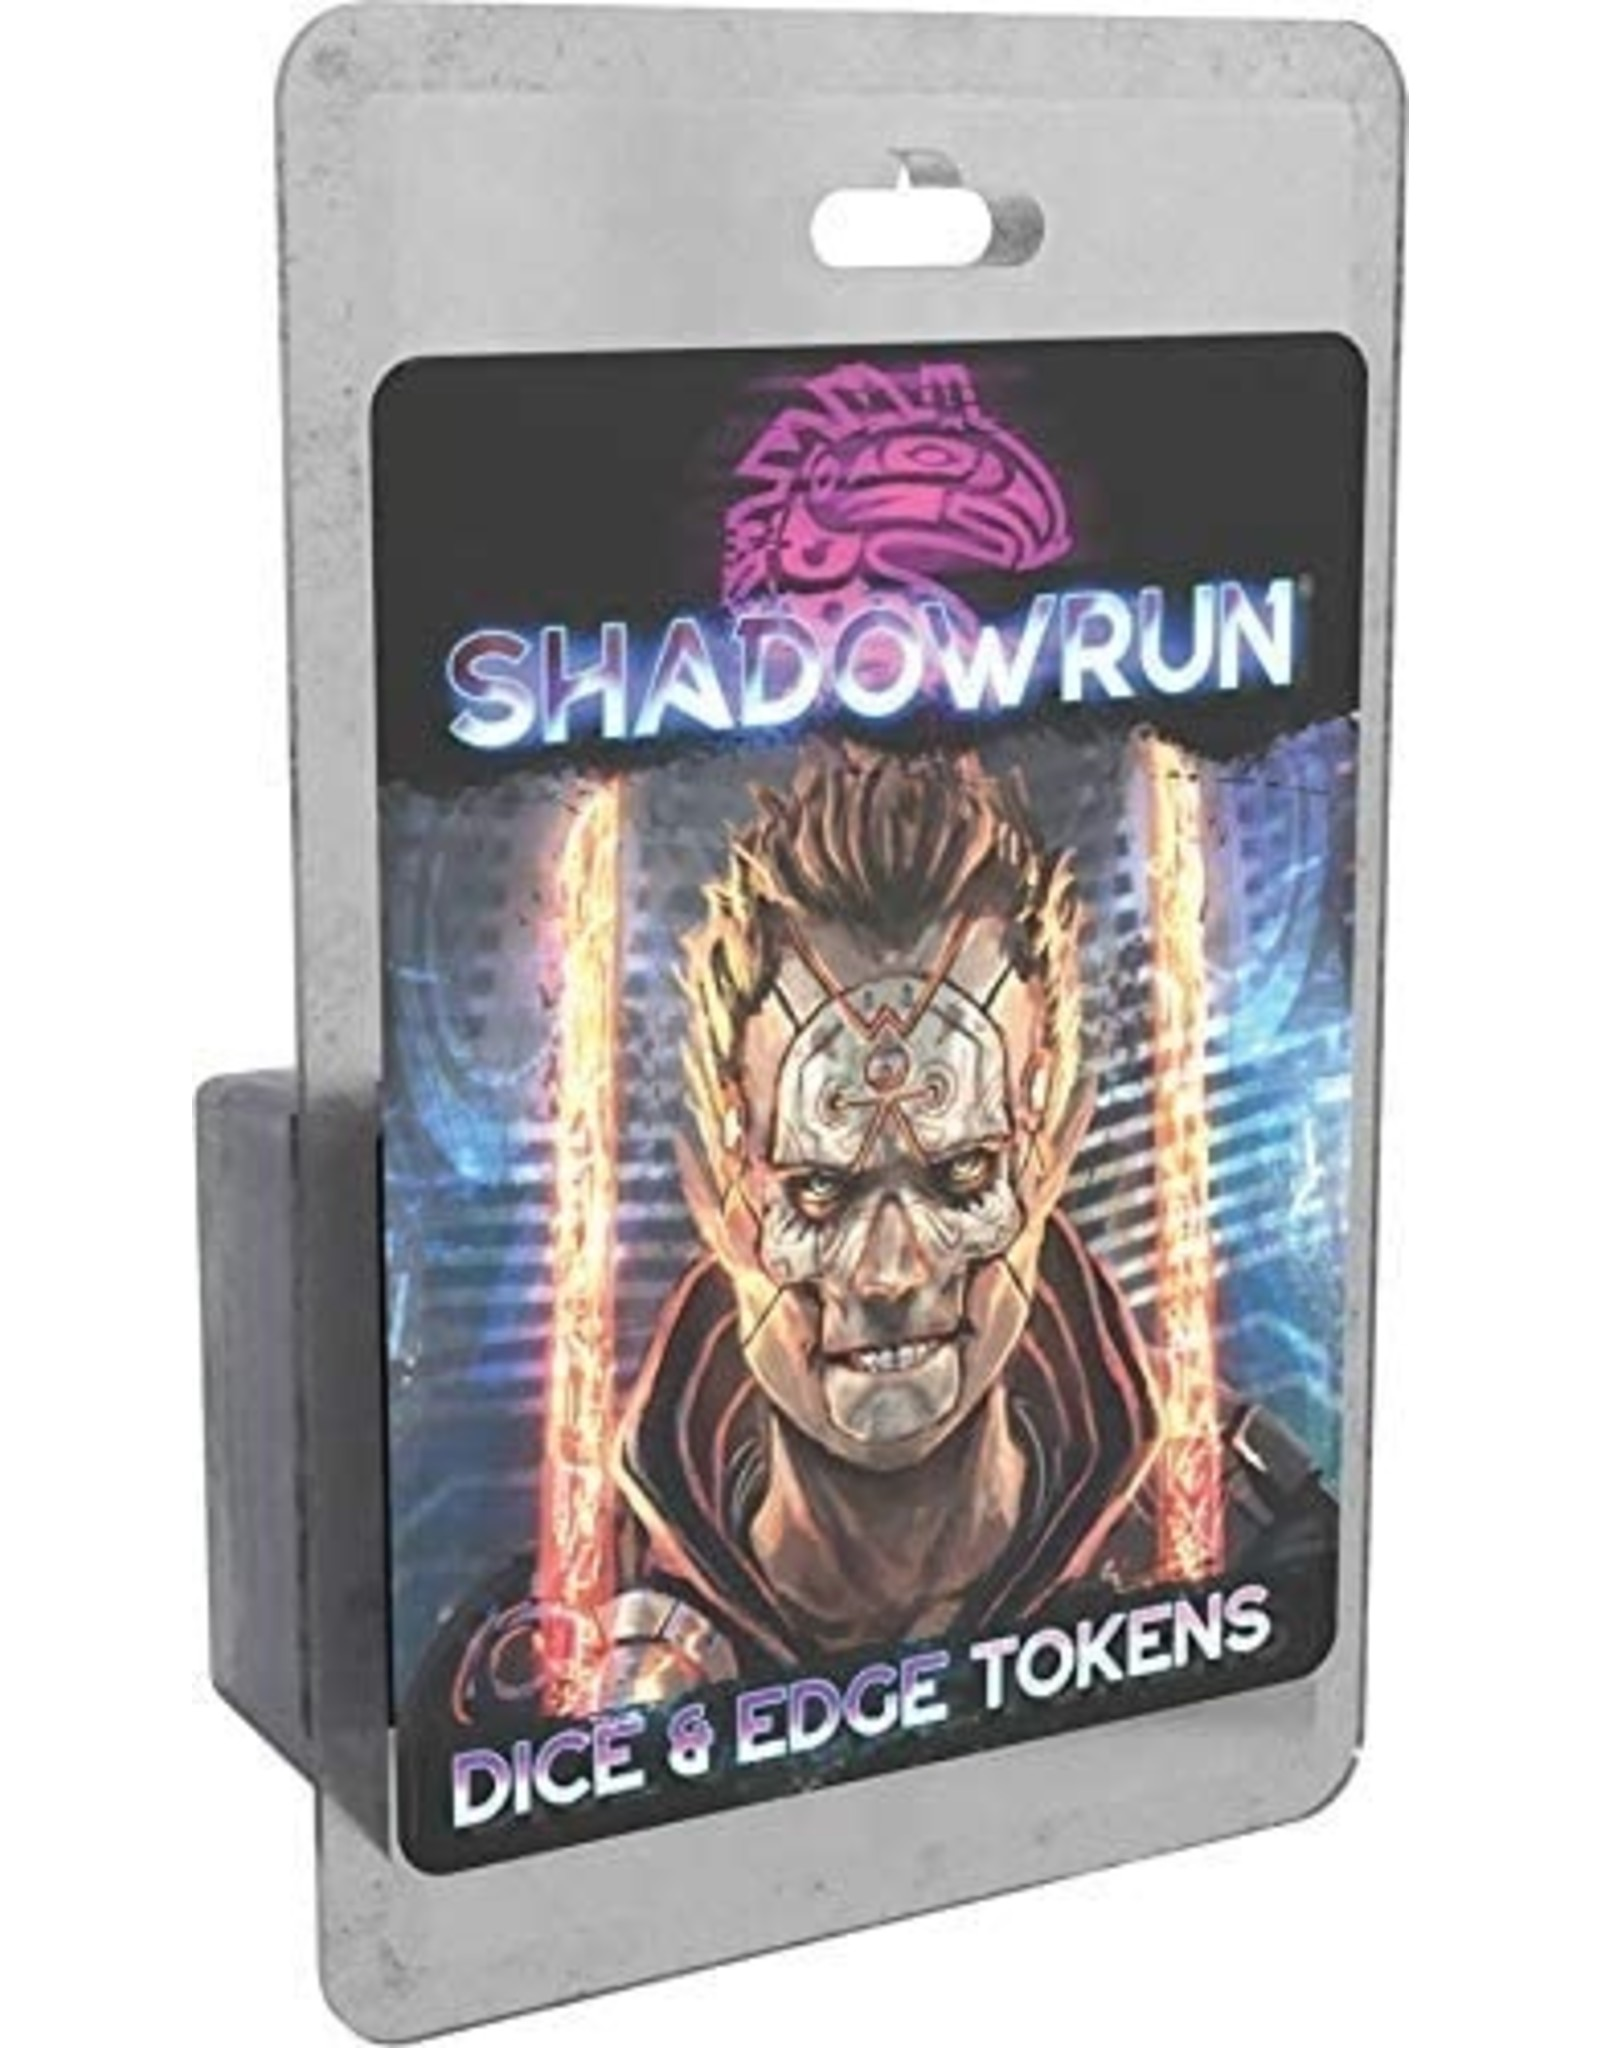 Catalyst Game Labs Shadowrun 6E: Dice & Edge Tokens